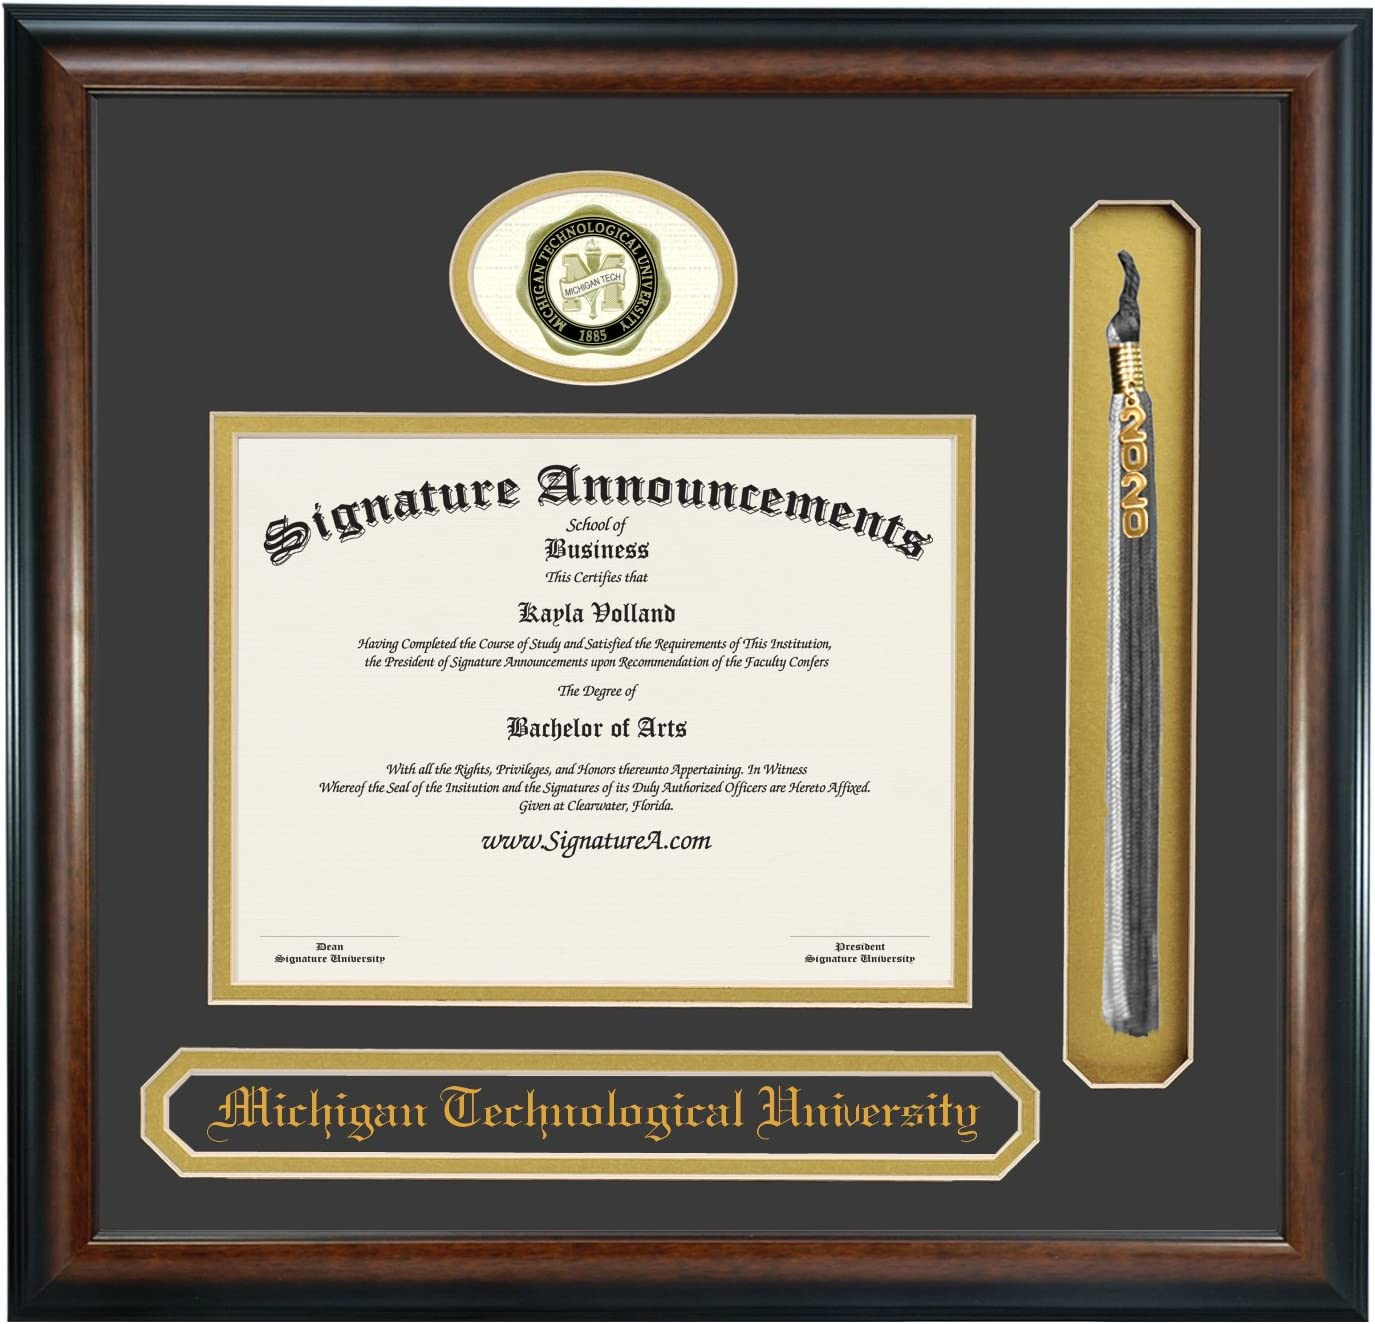 Professional//Doctor Sculpted Foil Seal Matte Mahogany 16 x 16 Name /& Tassel Graduation Diploma Frame Signature Announcements Michigan Technological University Undergraduate